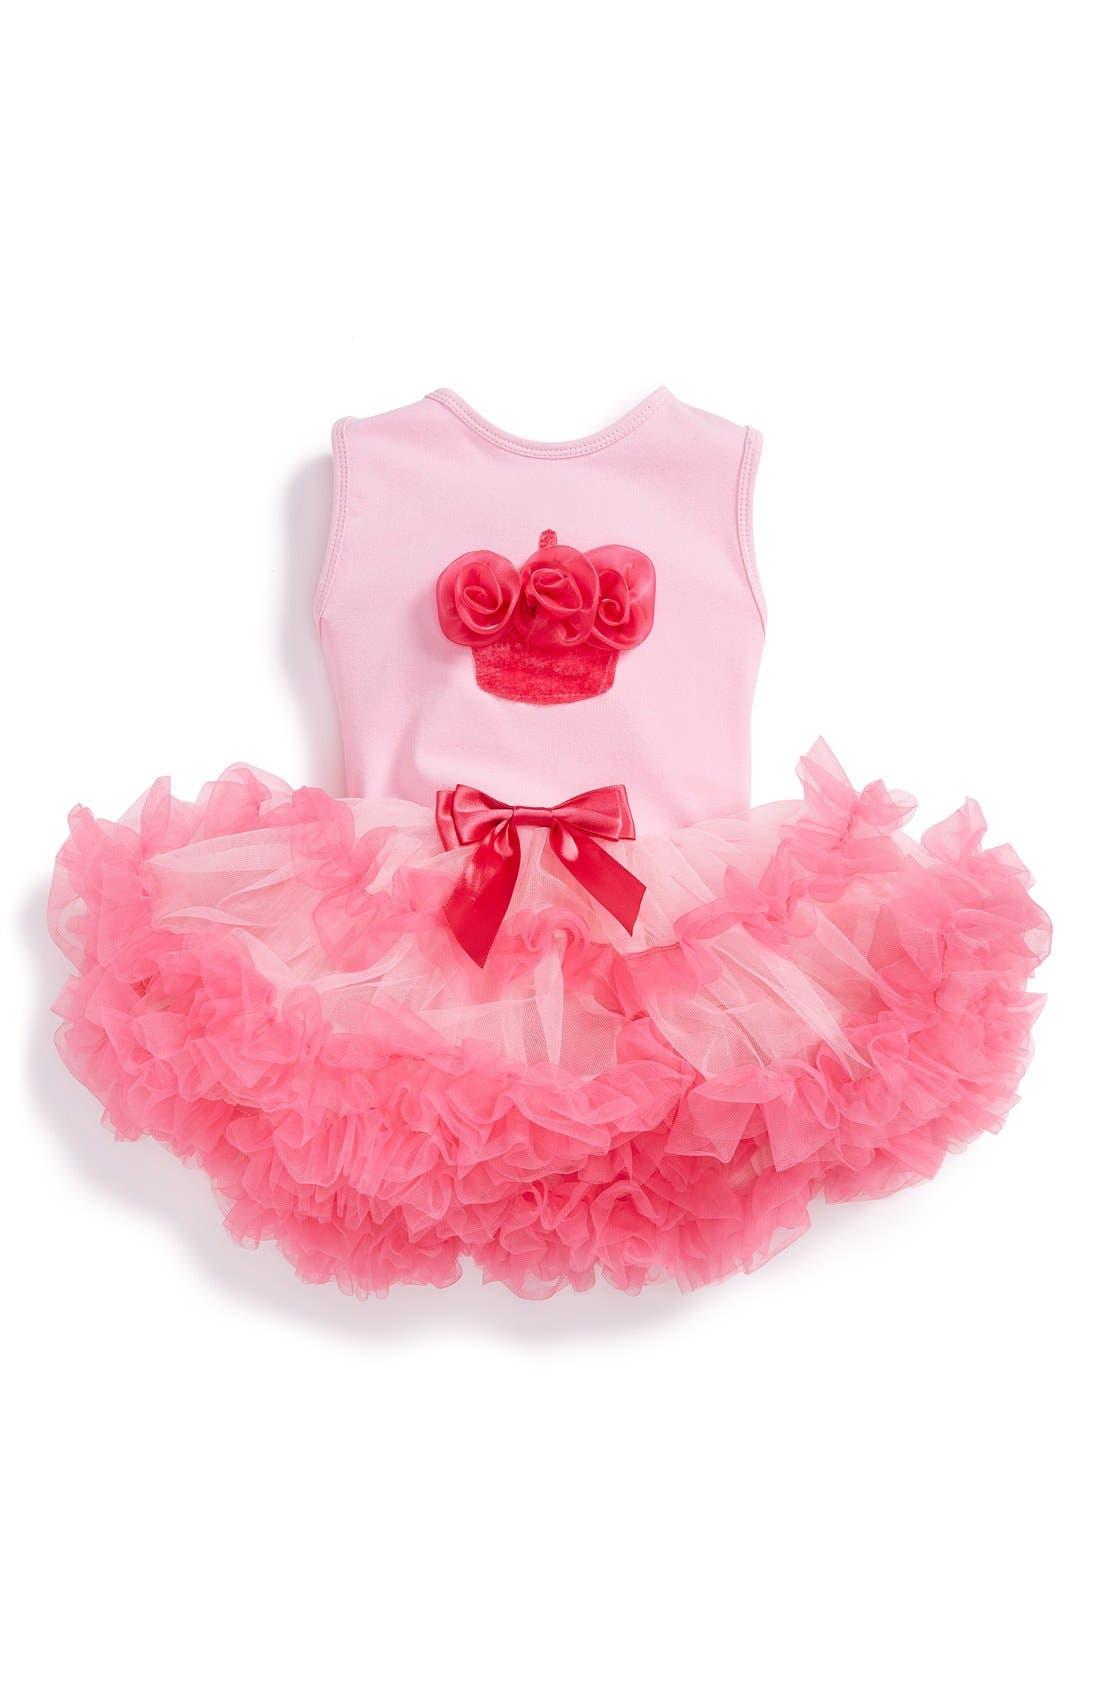 Alternate Image 1 Selected - Popatu 'Birthday' Sleeveless Tutu Dress (Baby Girls)